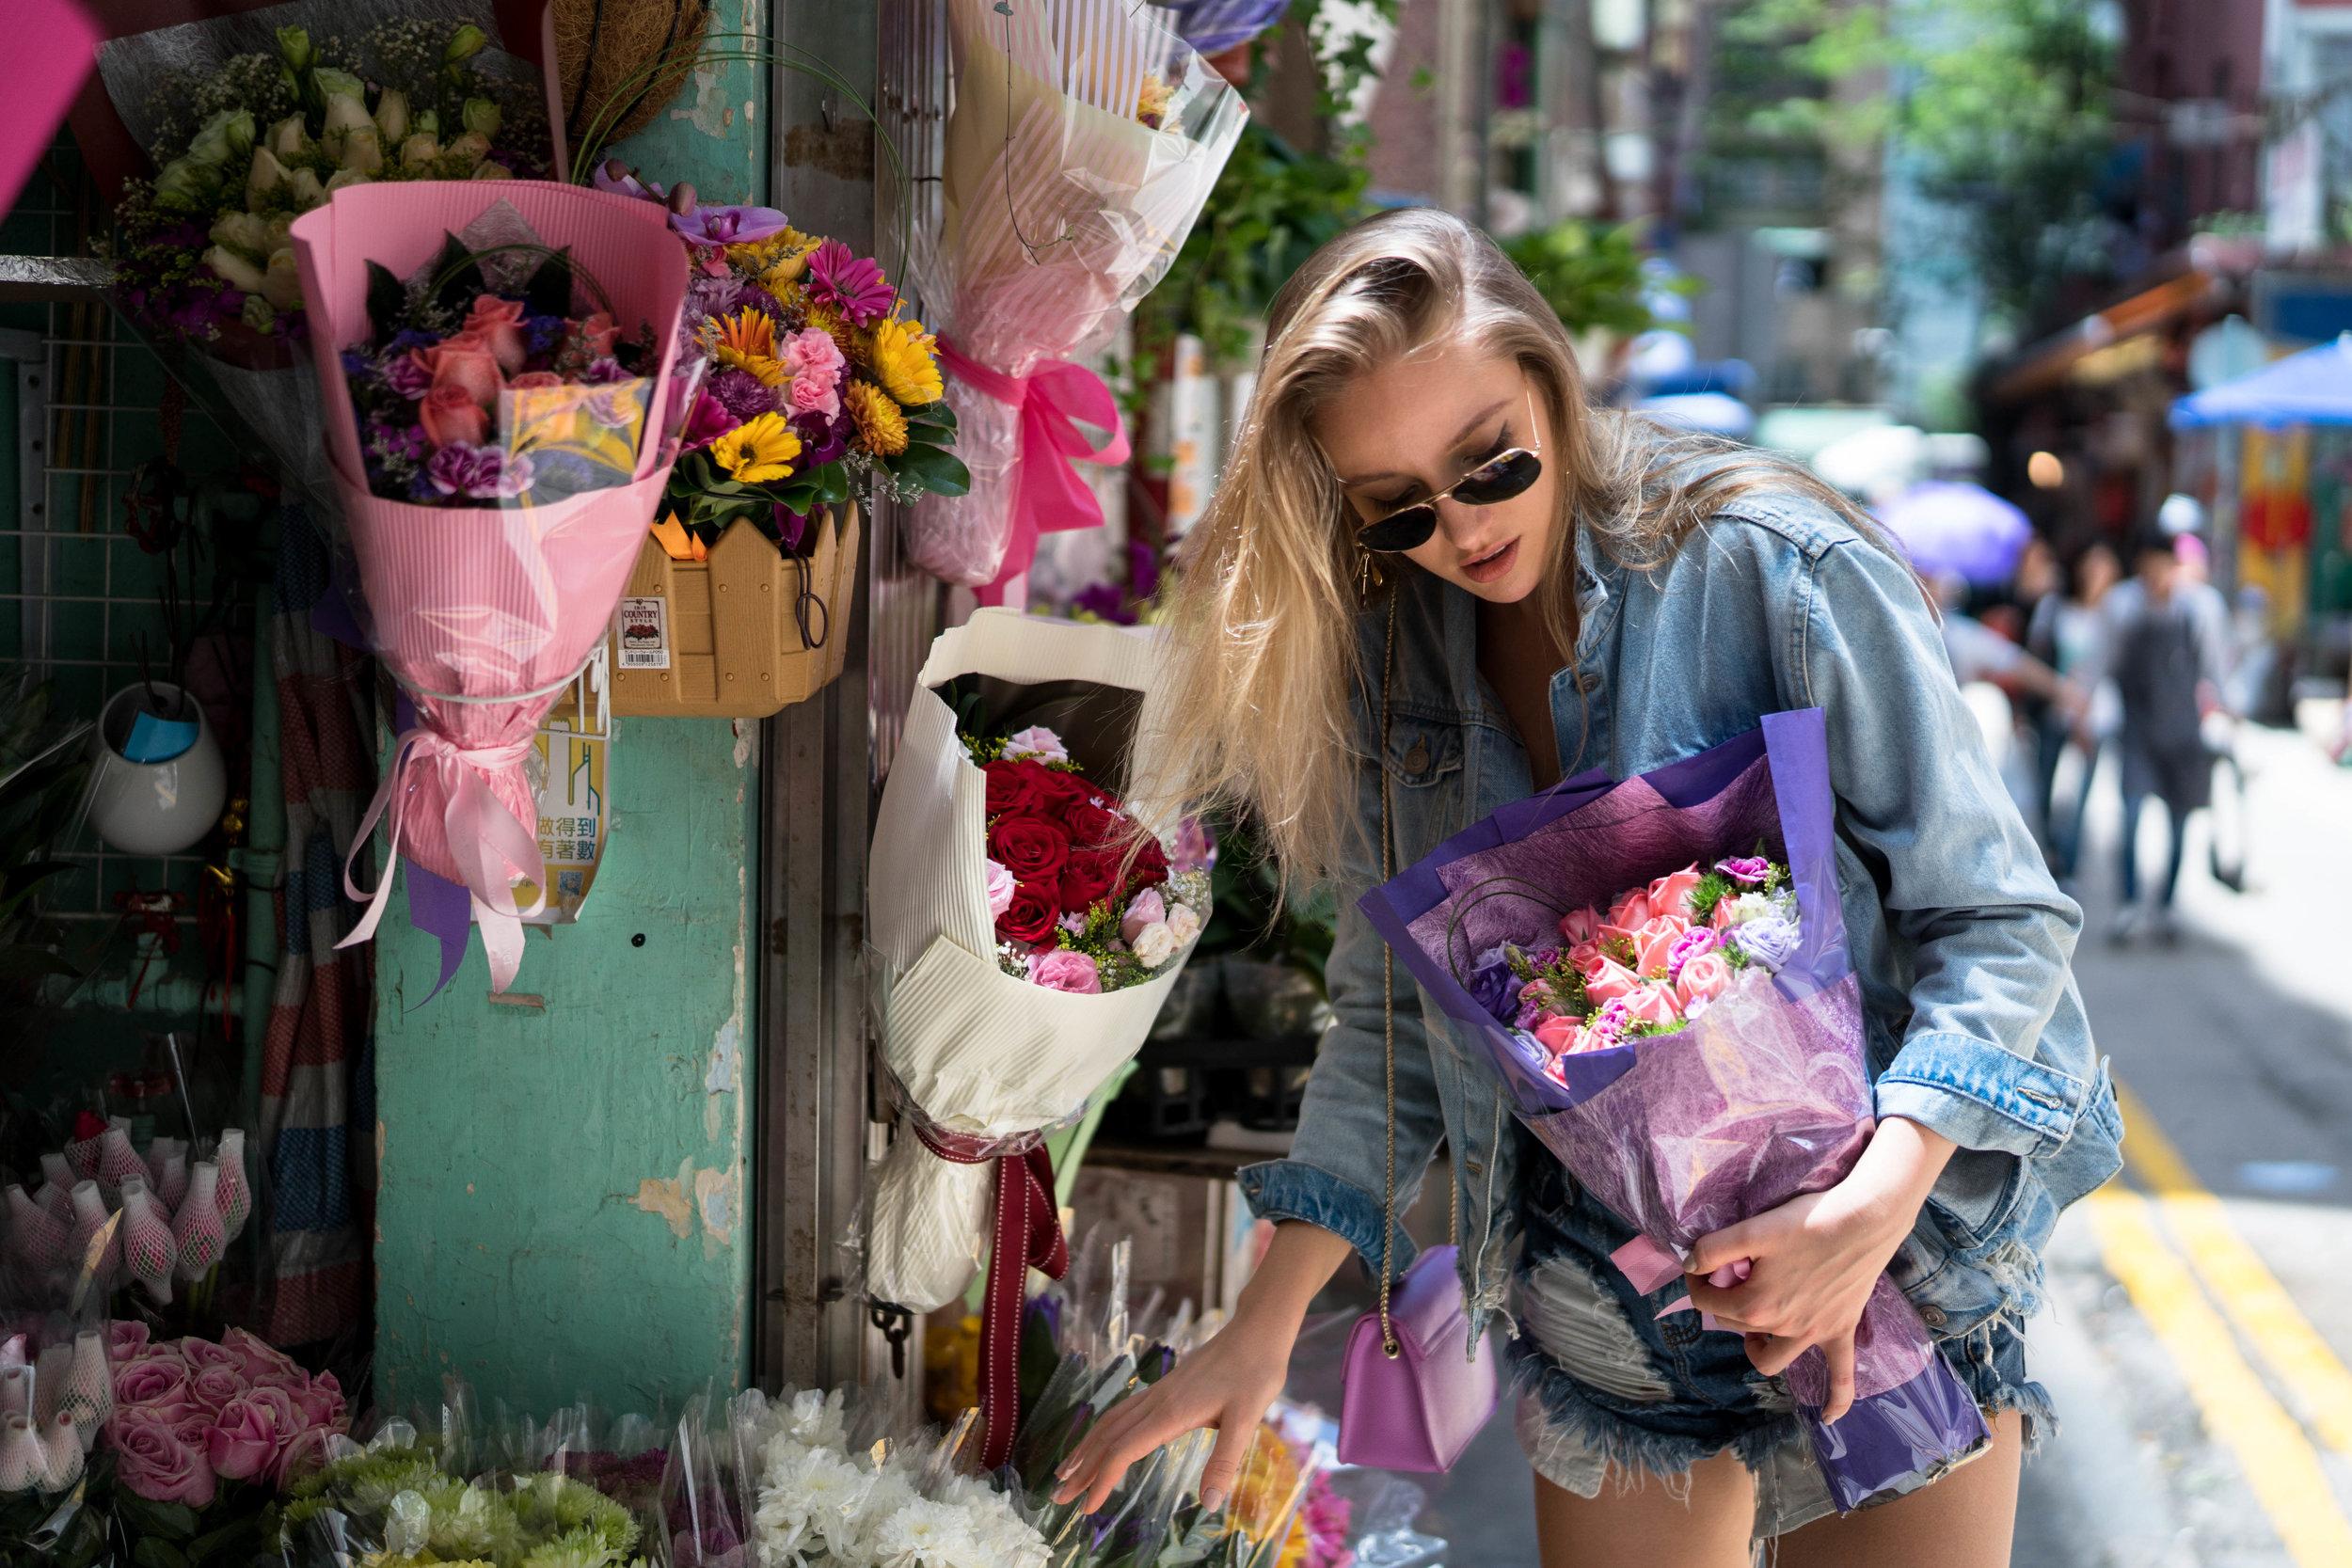 ISO 320, 1/4000s, f/1.4 - Yana having fun at the florist